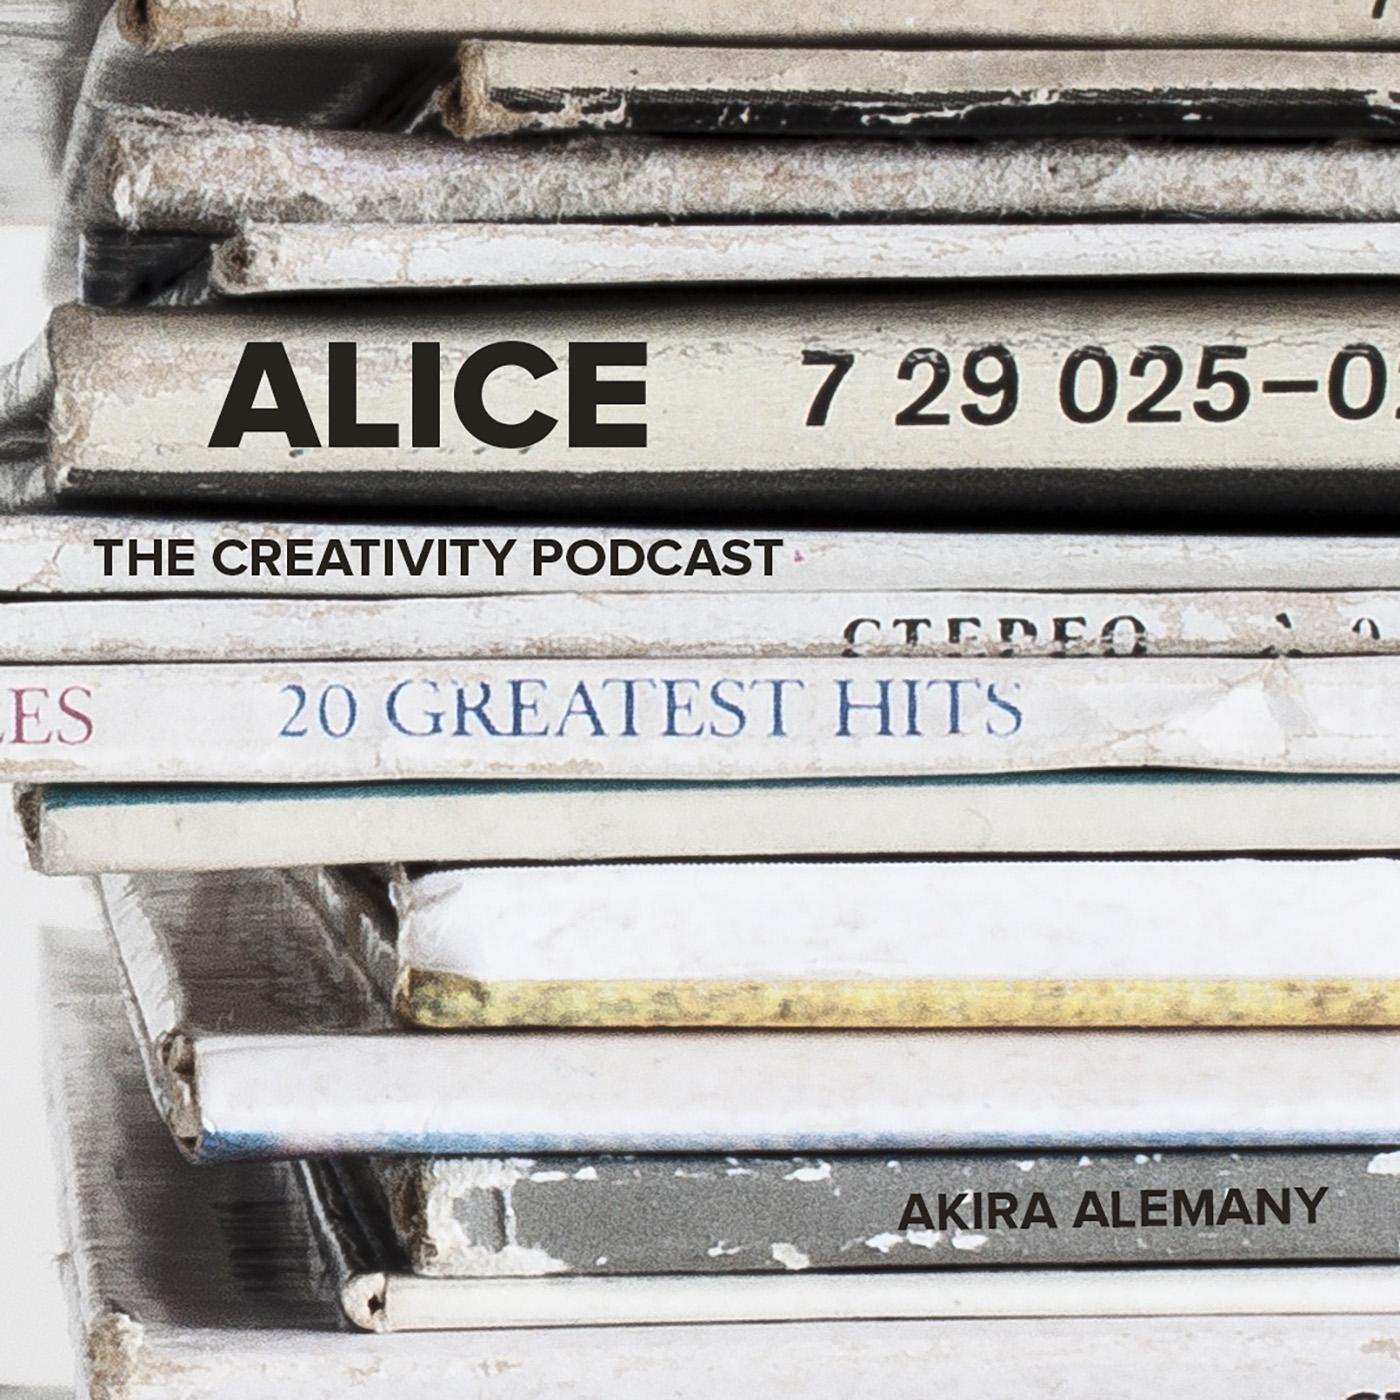 Alice: The Creativity Podcast - Slapback Media